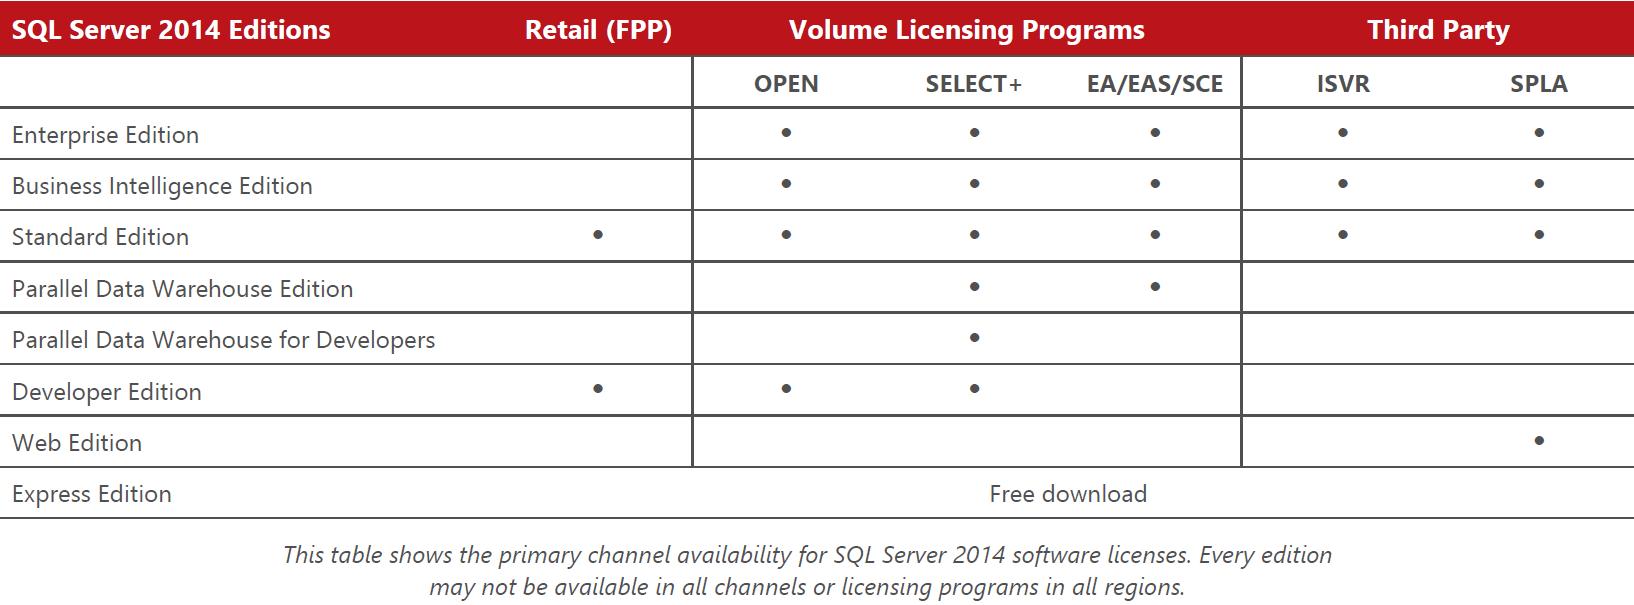 Microsoft SQL 2014 Licensing in a VMware environment